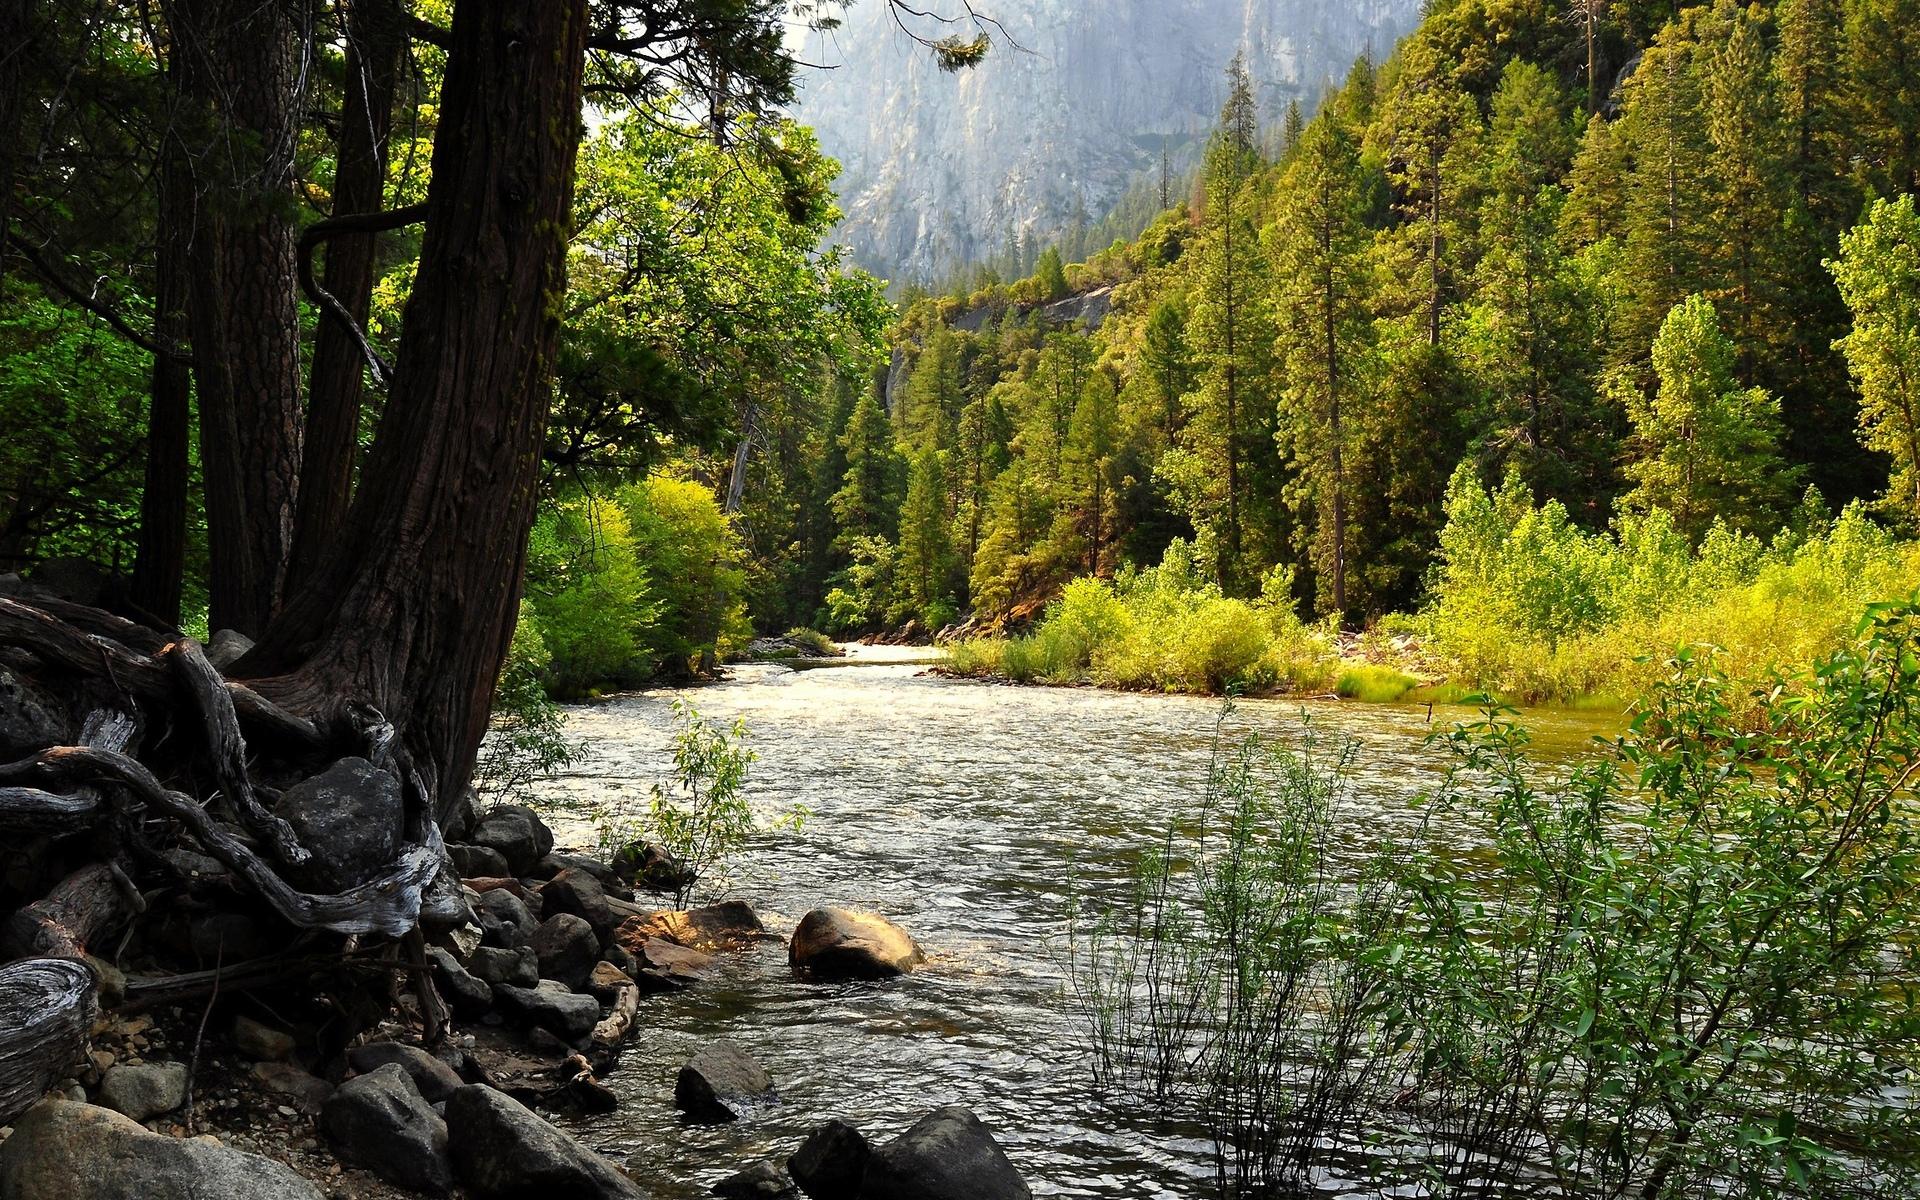 Природа пейзажи реки потоков берег